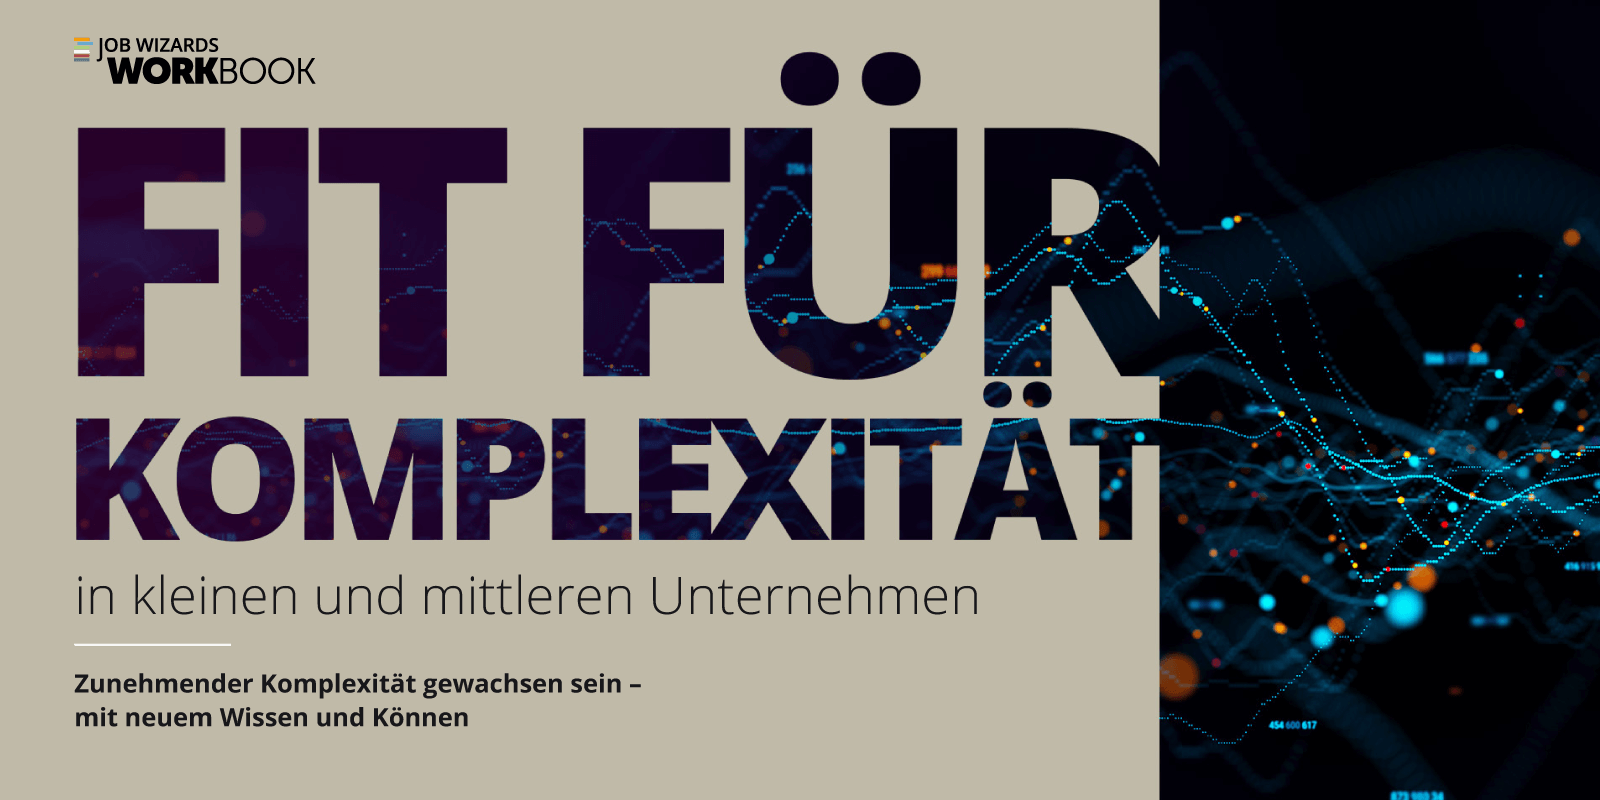 Titelblatt Workbook 4 Komplexitätsmanagement